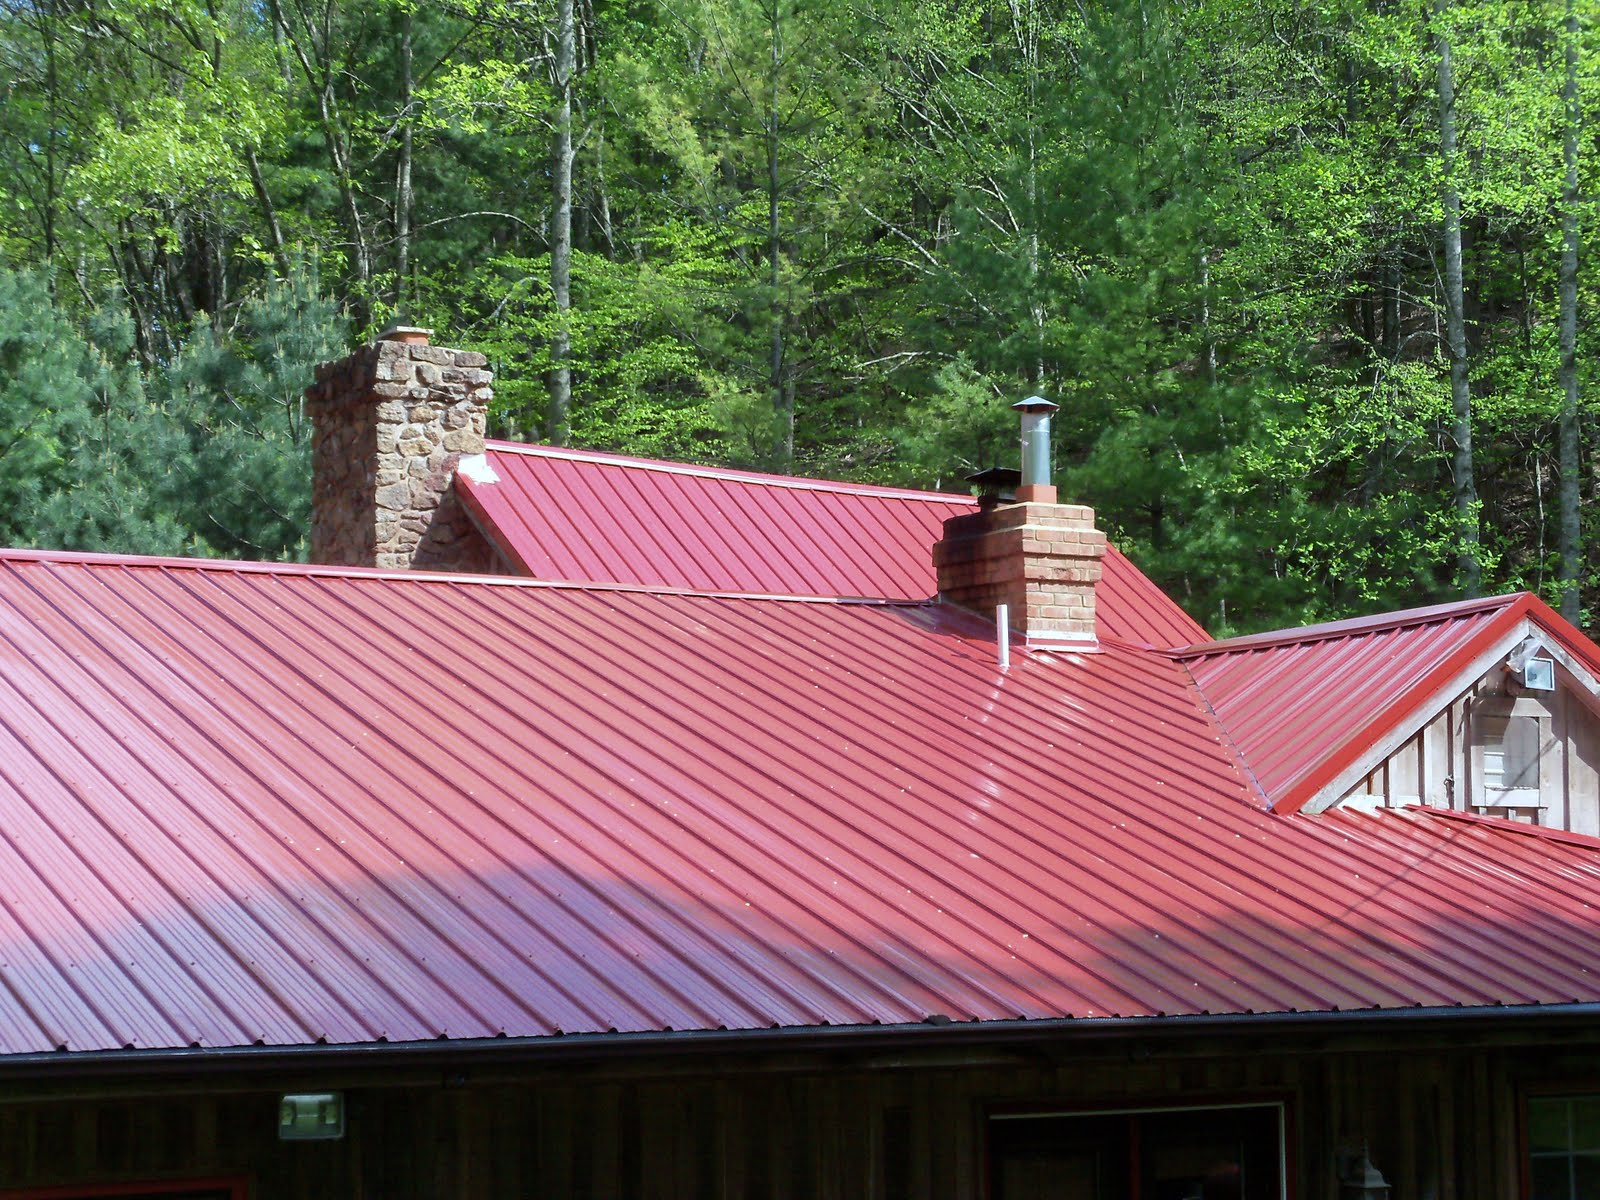 Premier Roofing Amp Remodeling Llc In Sidney Ny 13838